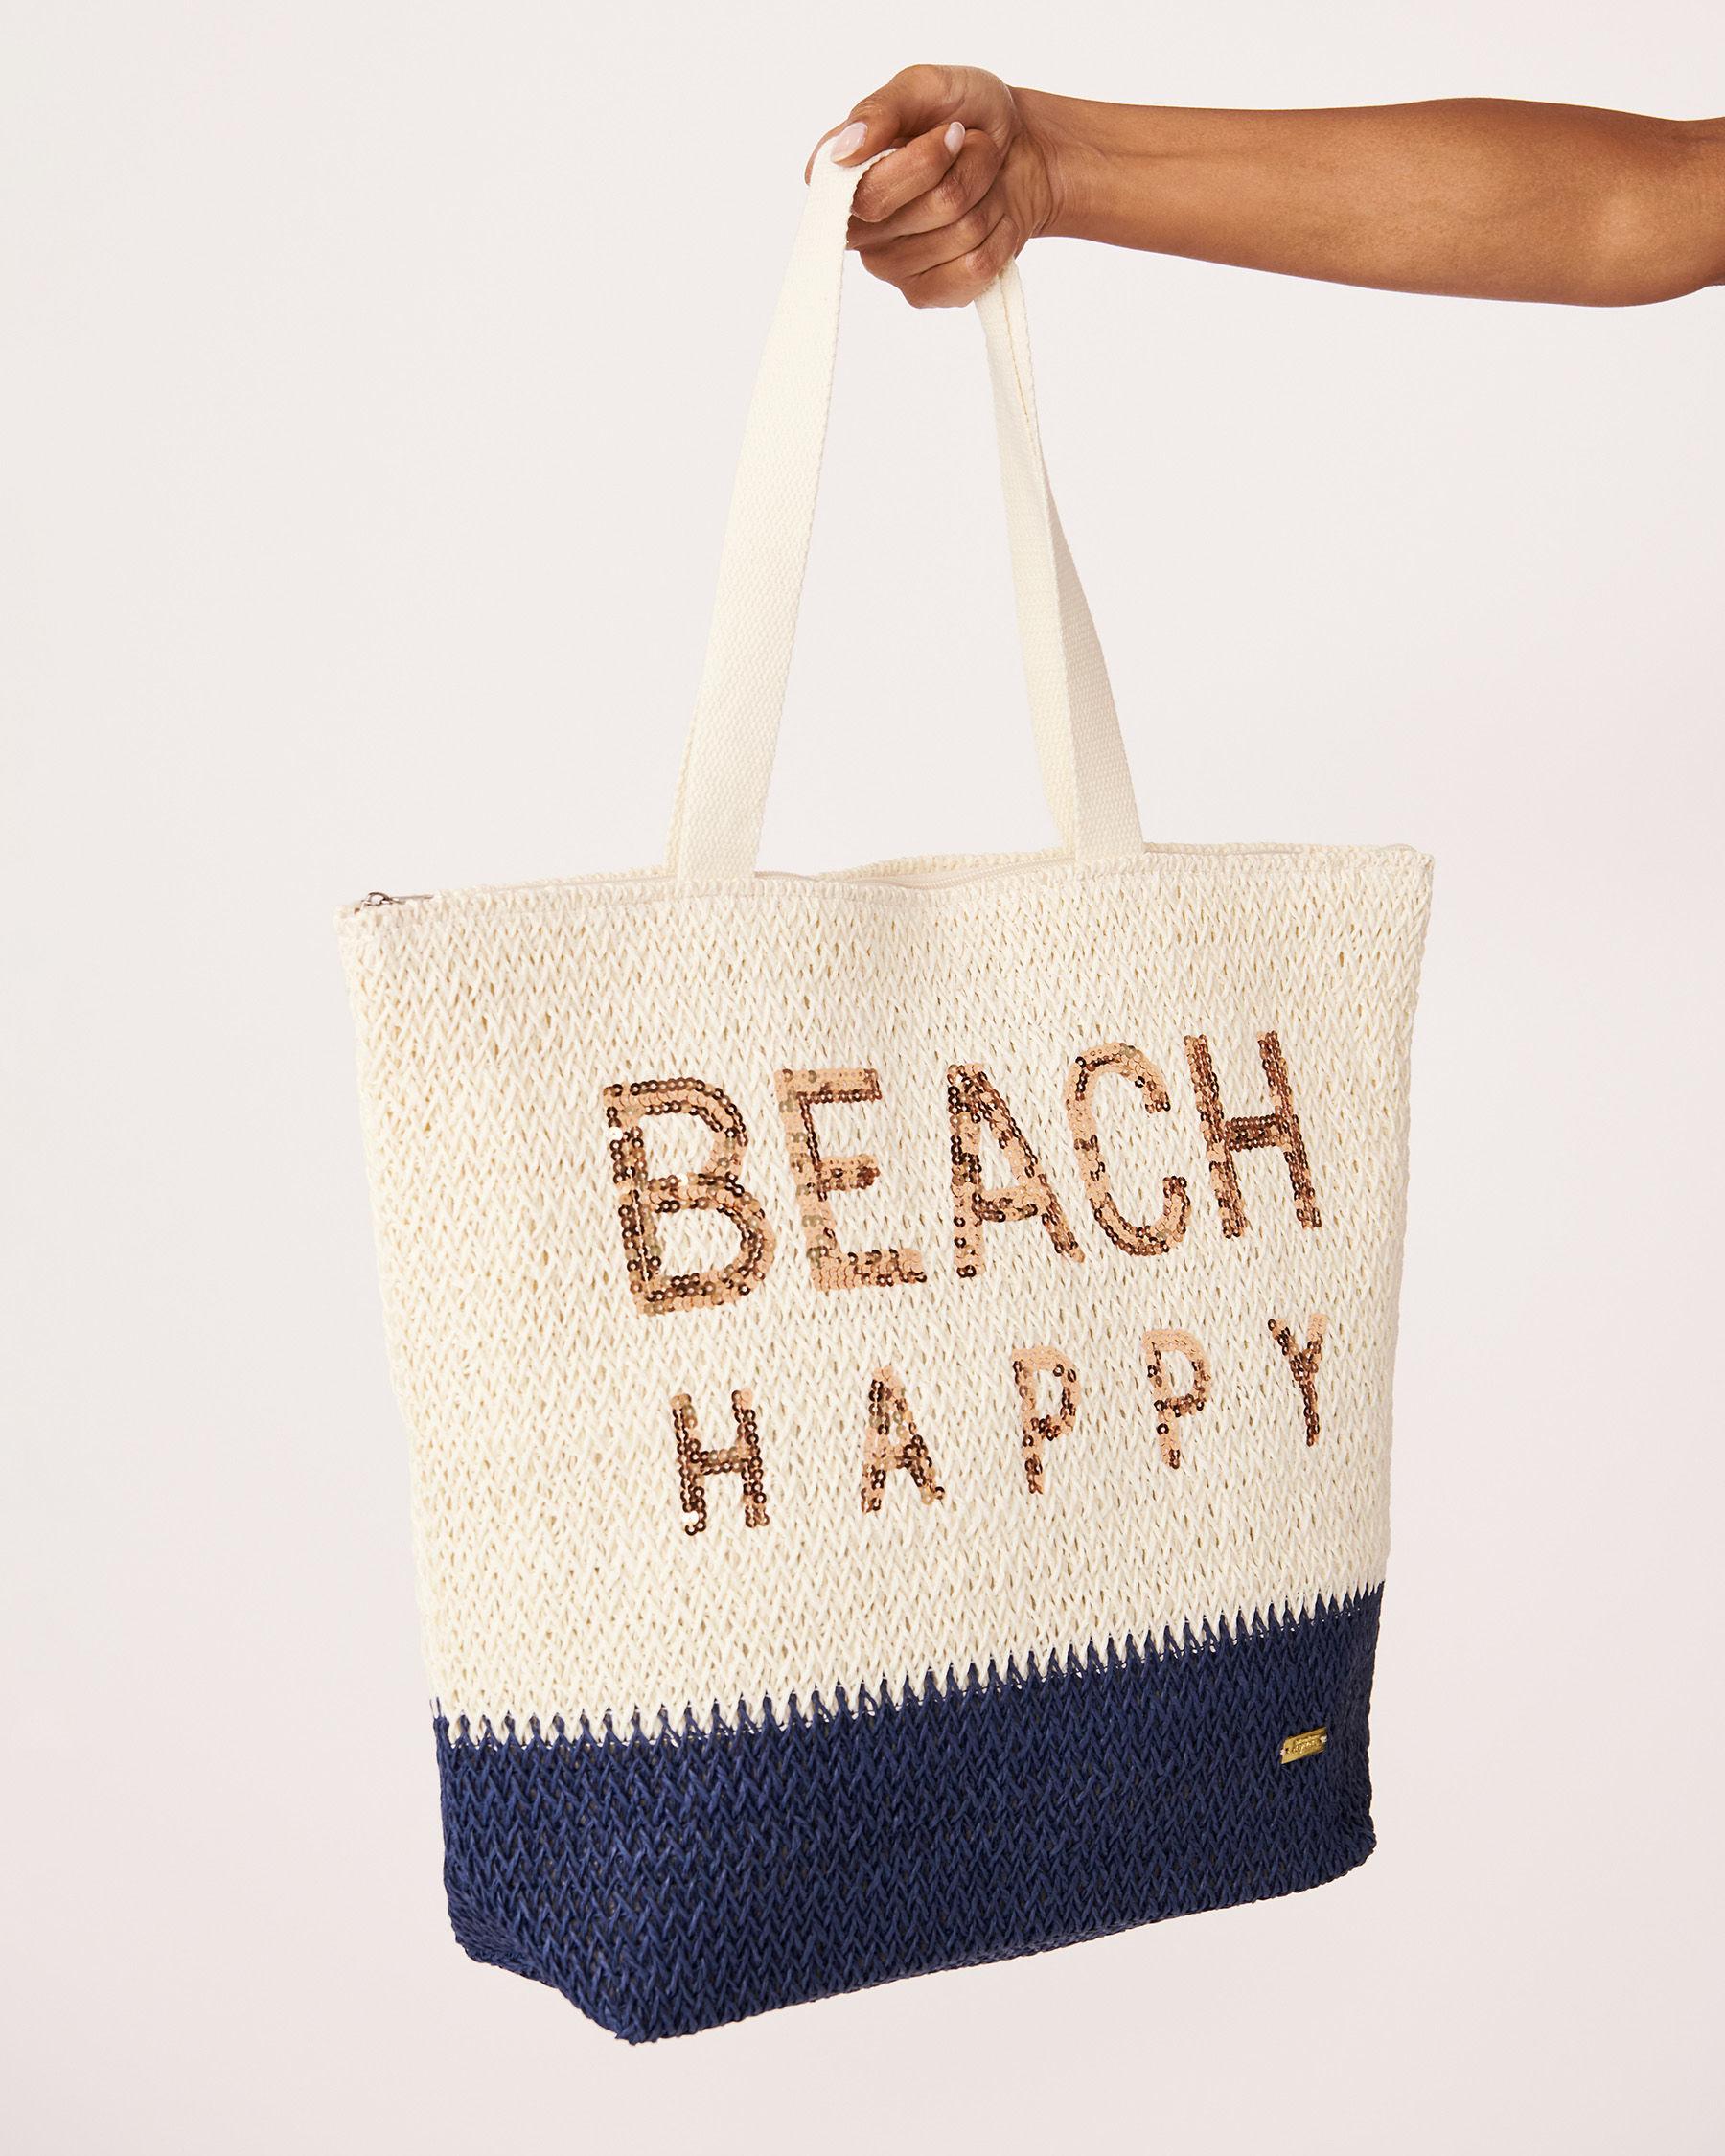 LA VIE EN ROSE AQUA BEACH HAPPY Bag Beige 635-661-0-11 - View2